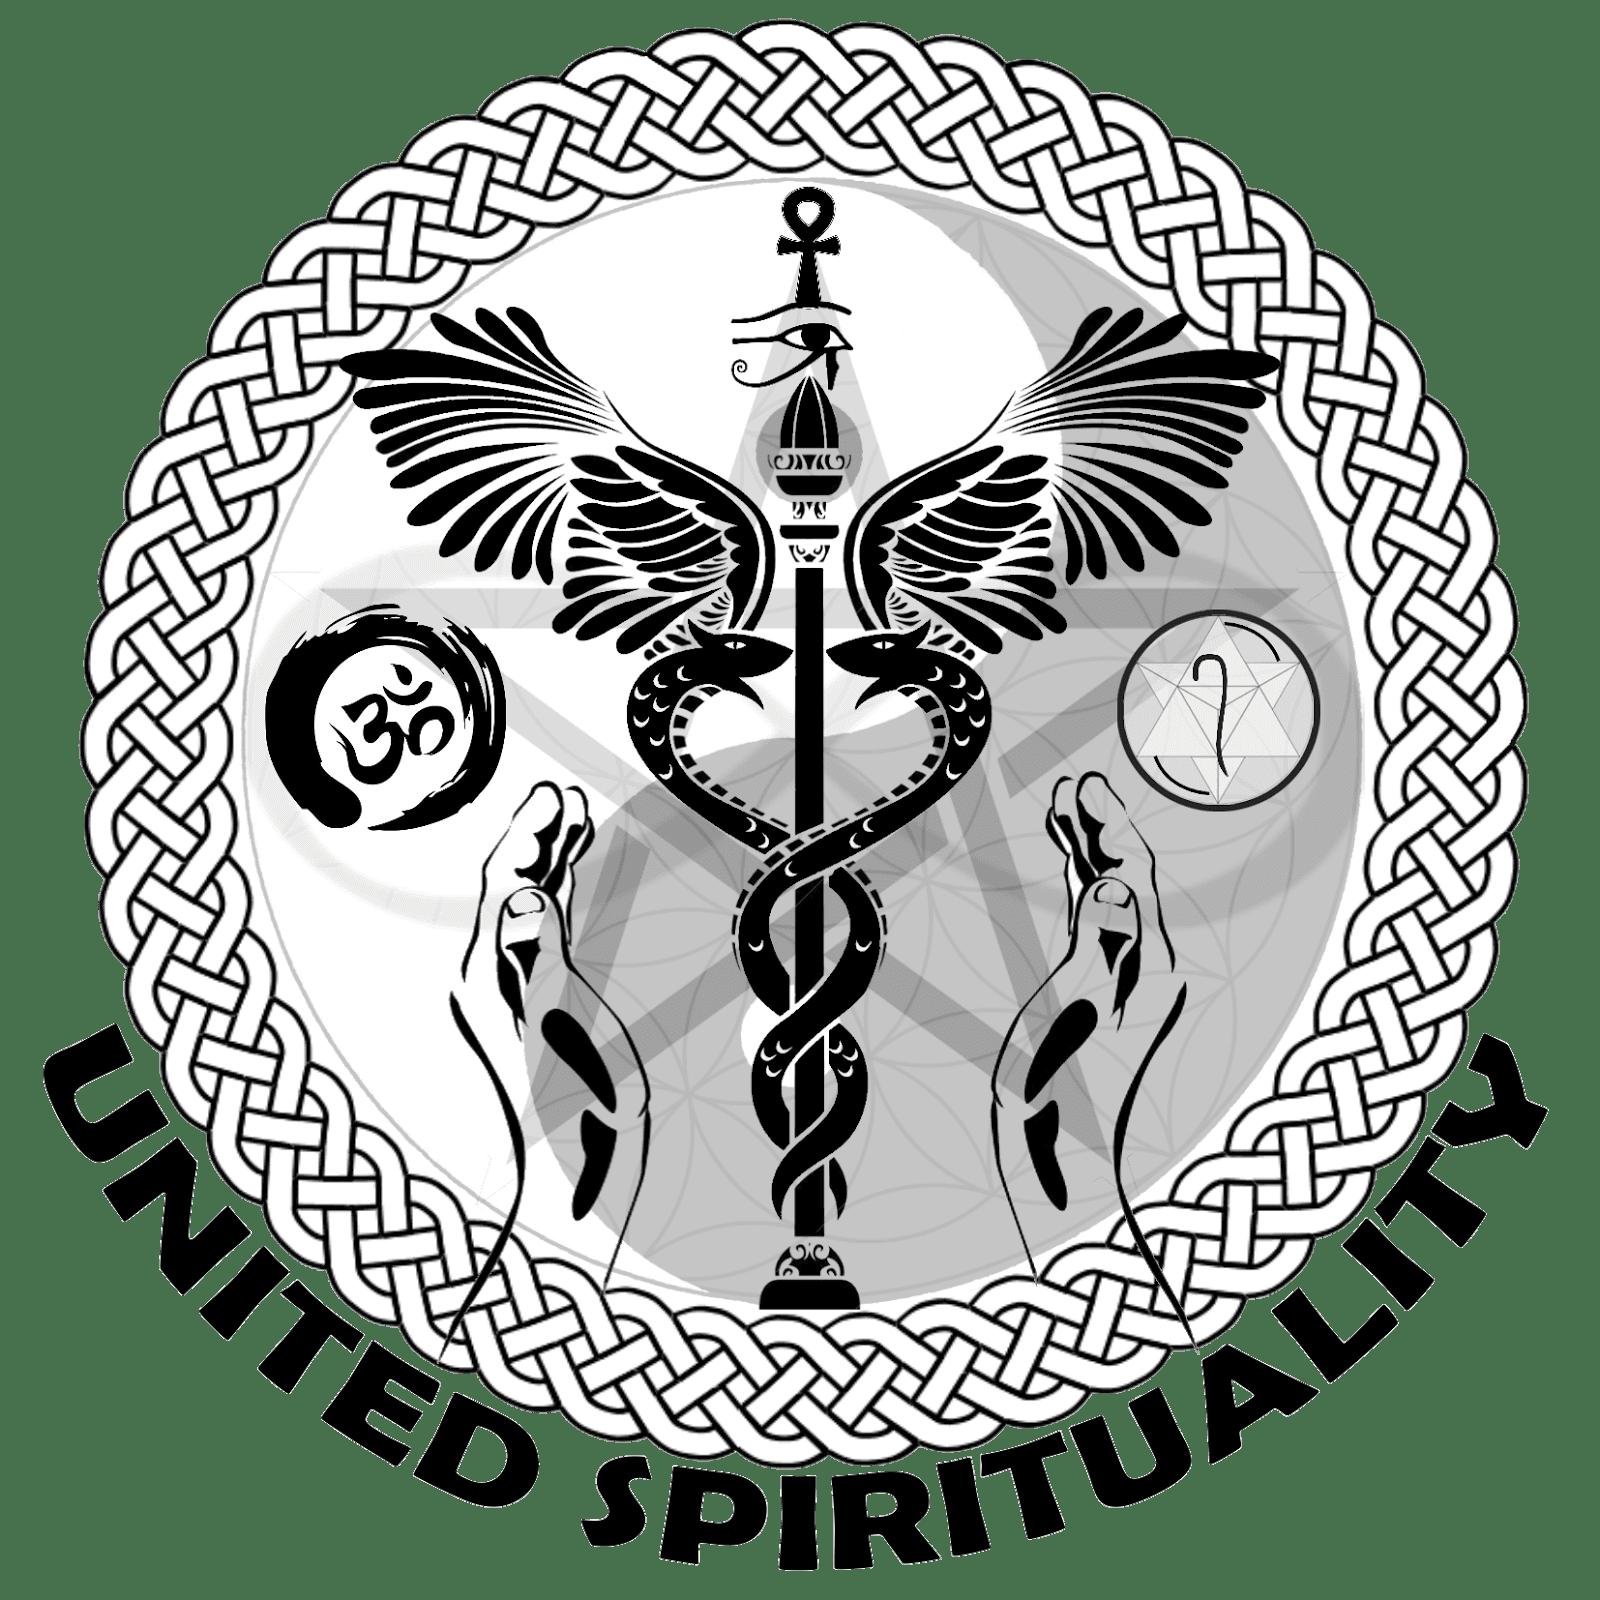 UNITED SPIRITUALITY